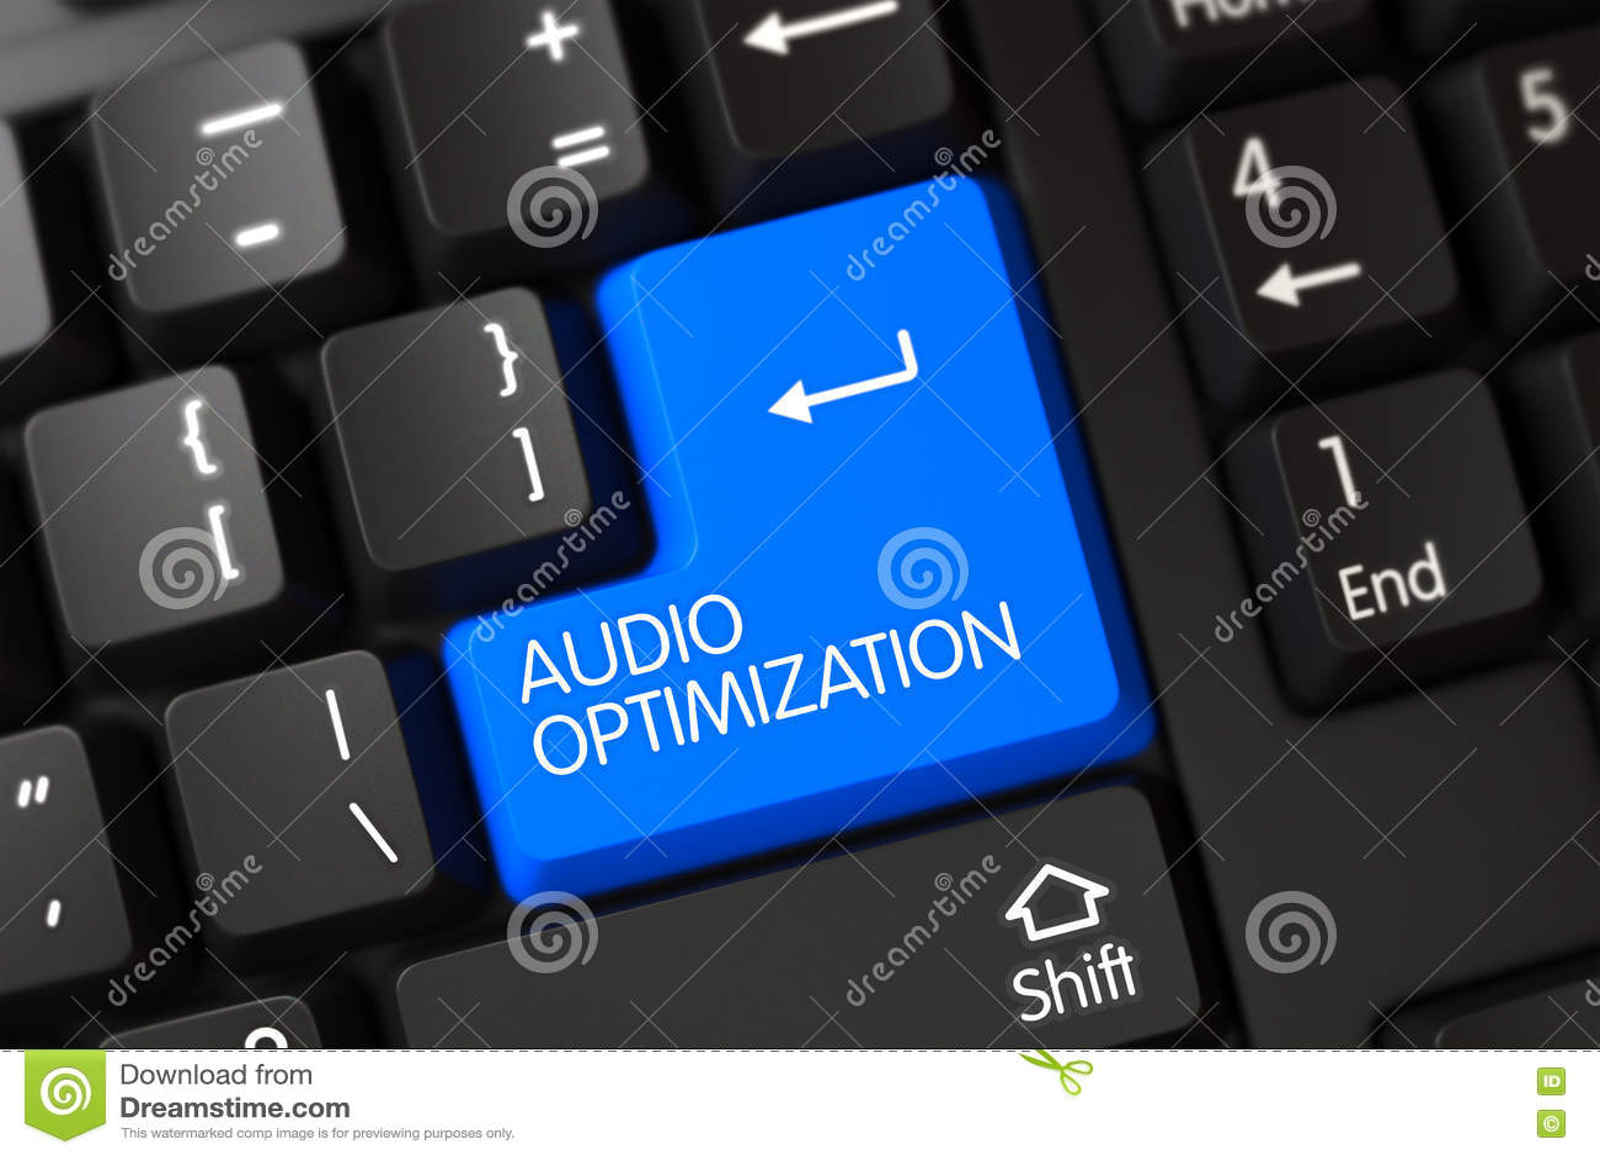 Ljudsignal Optimization - svart tangent 3d